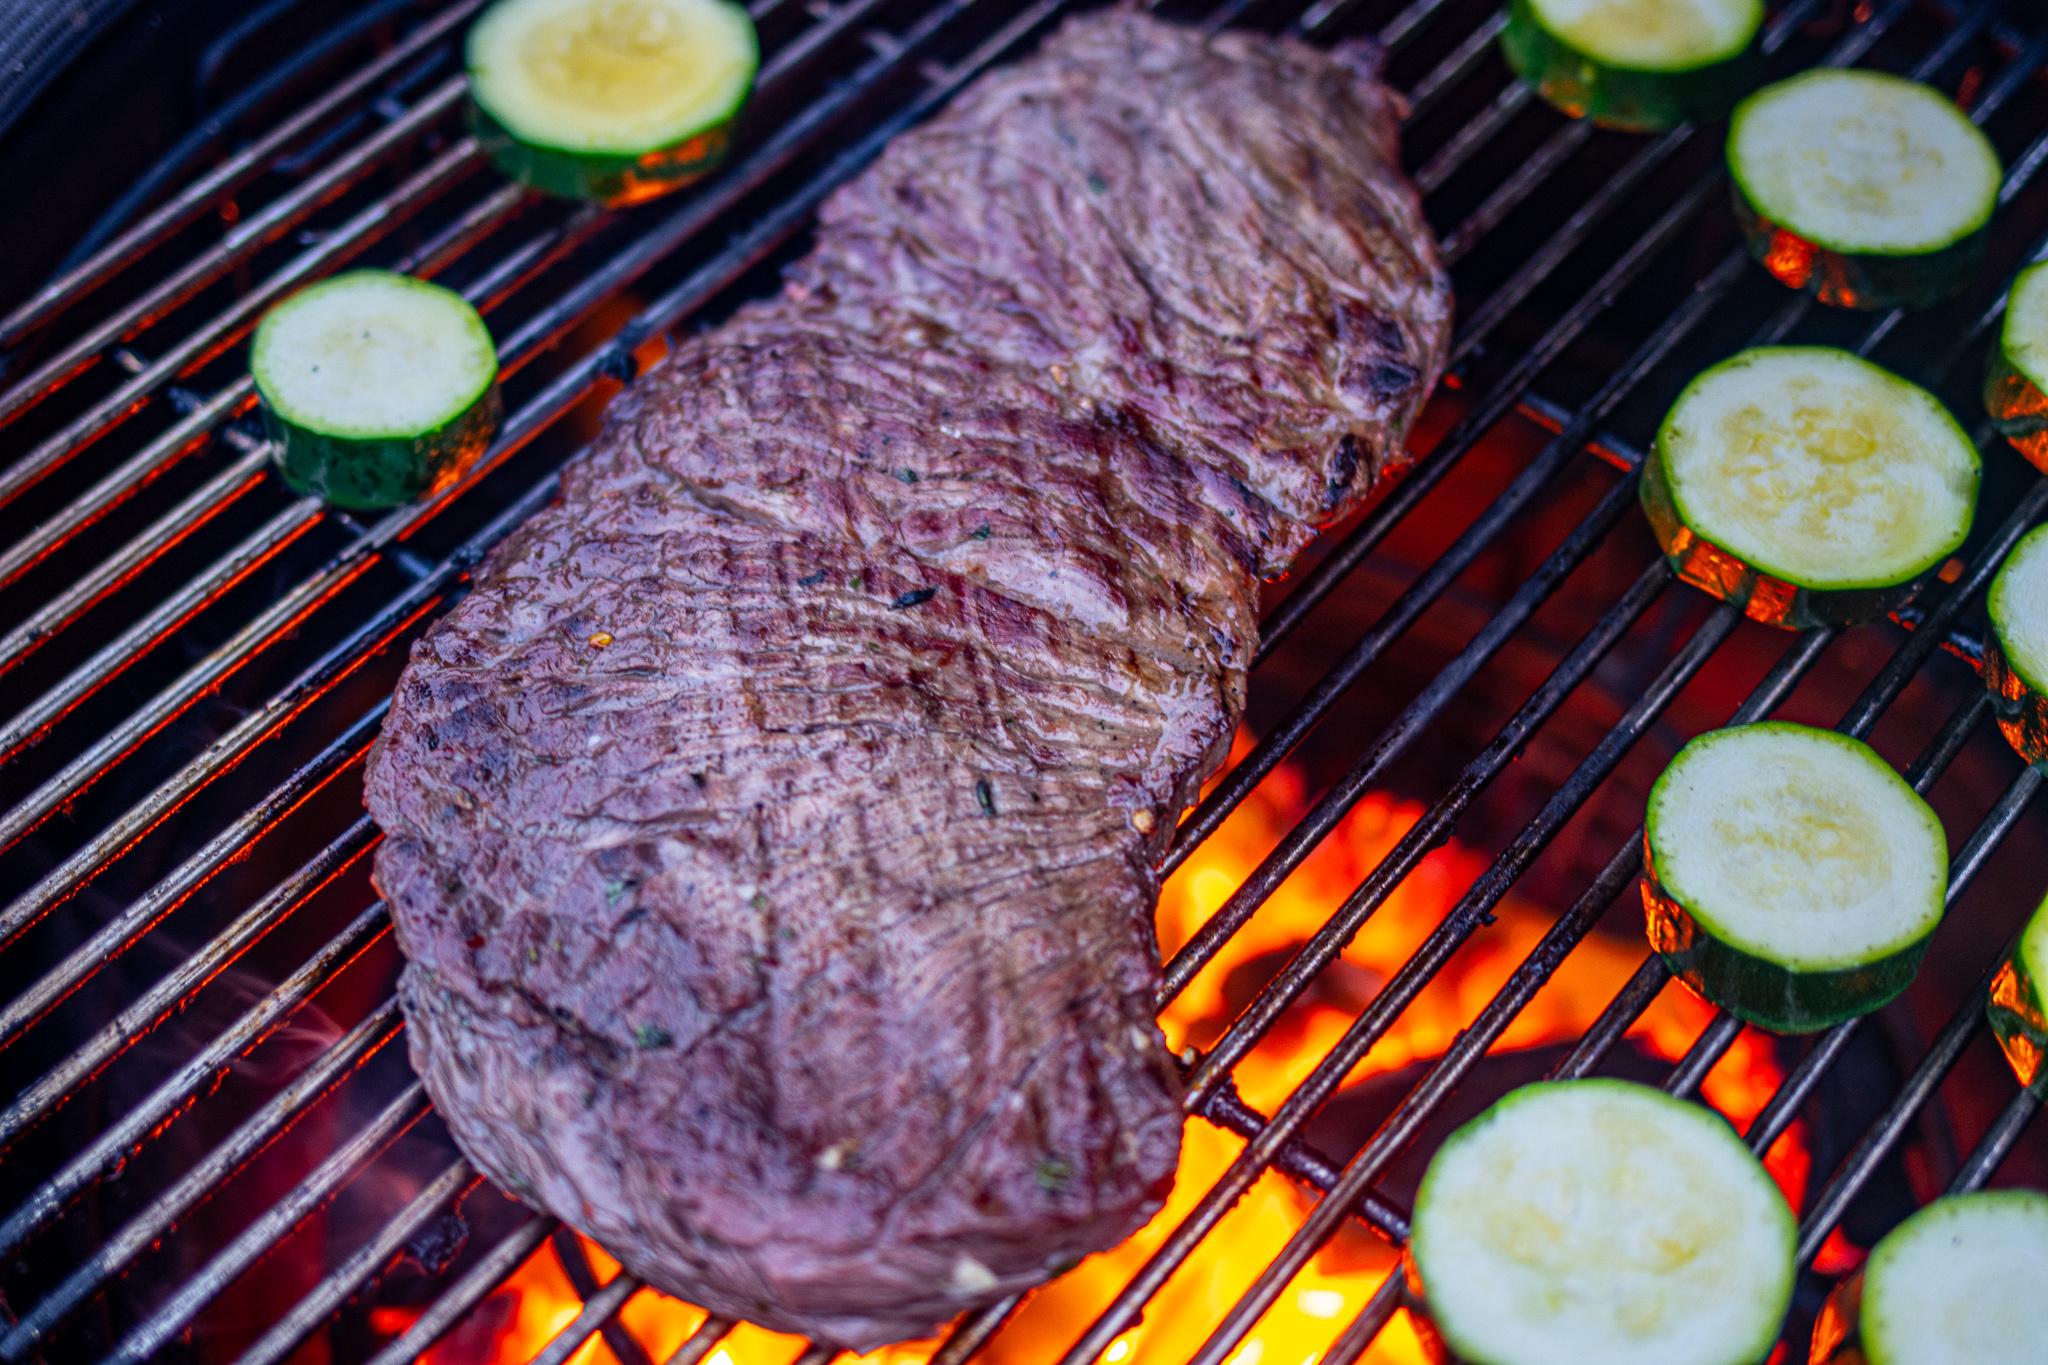 Recept Bavette - Koriander limoen op de BBQ